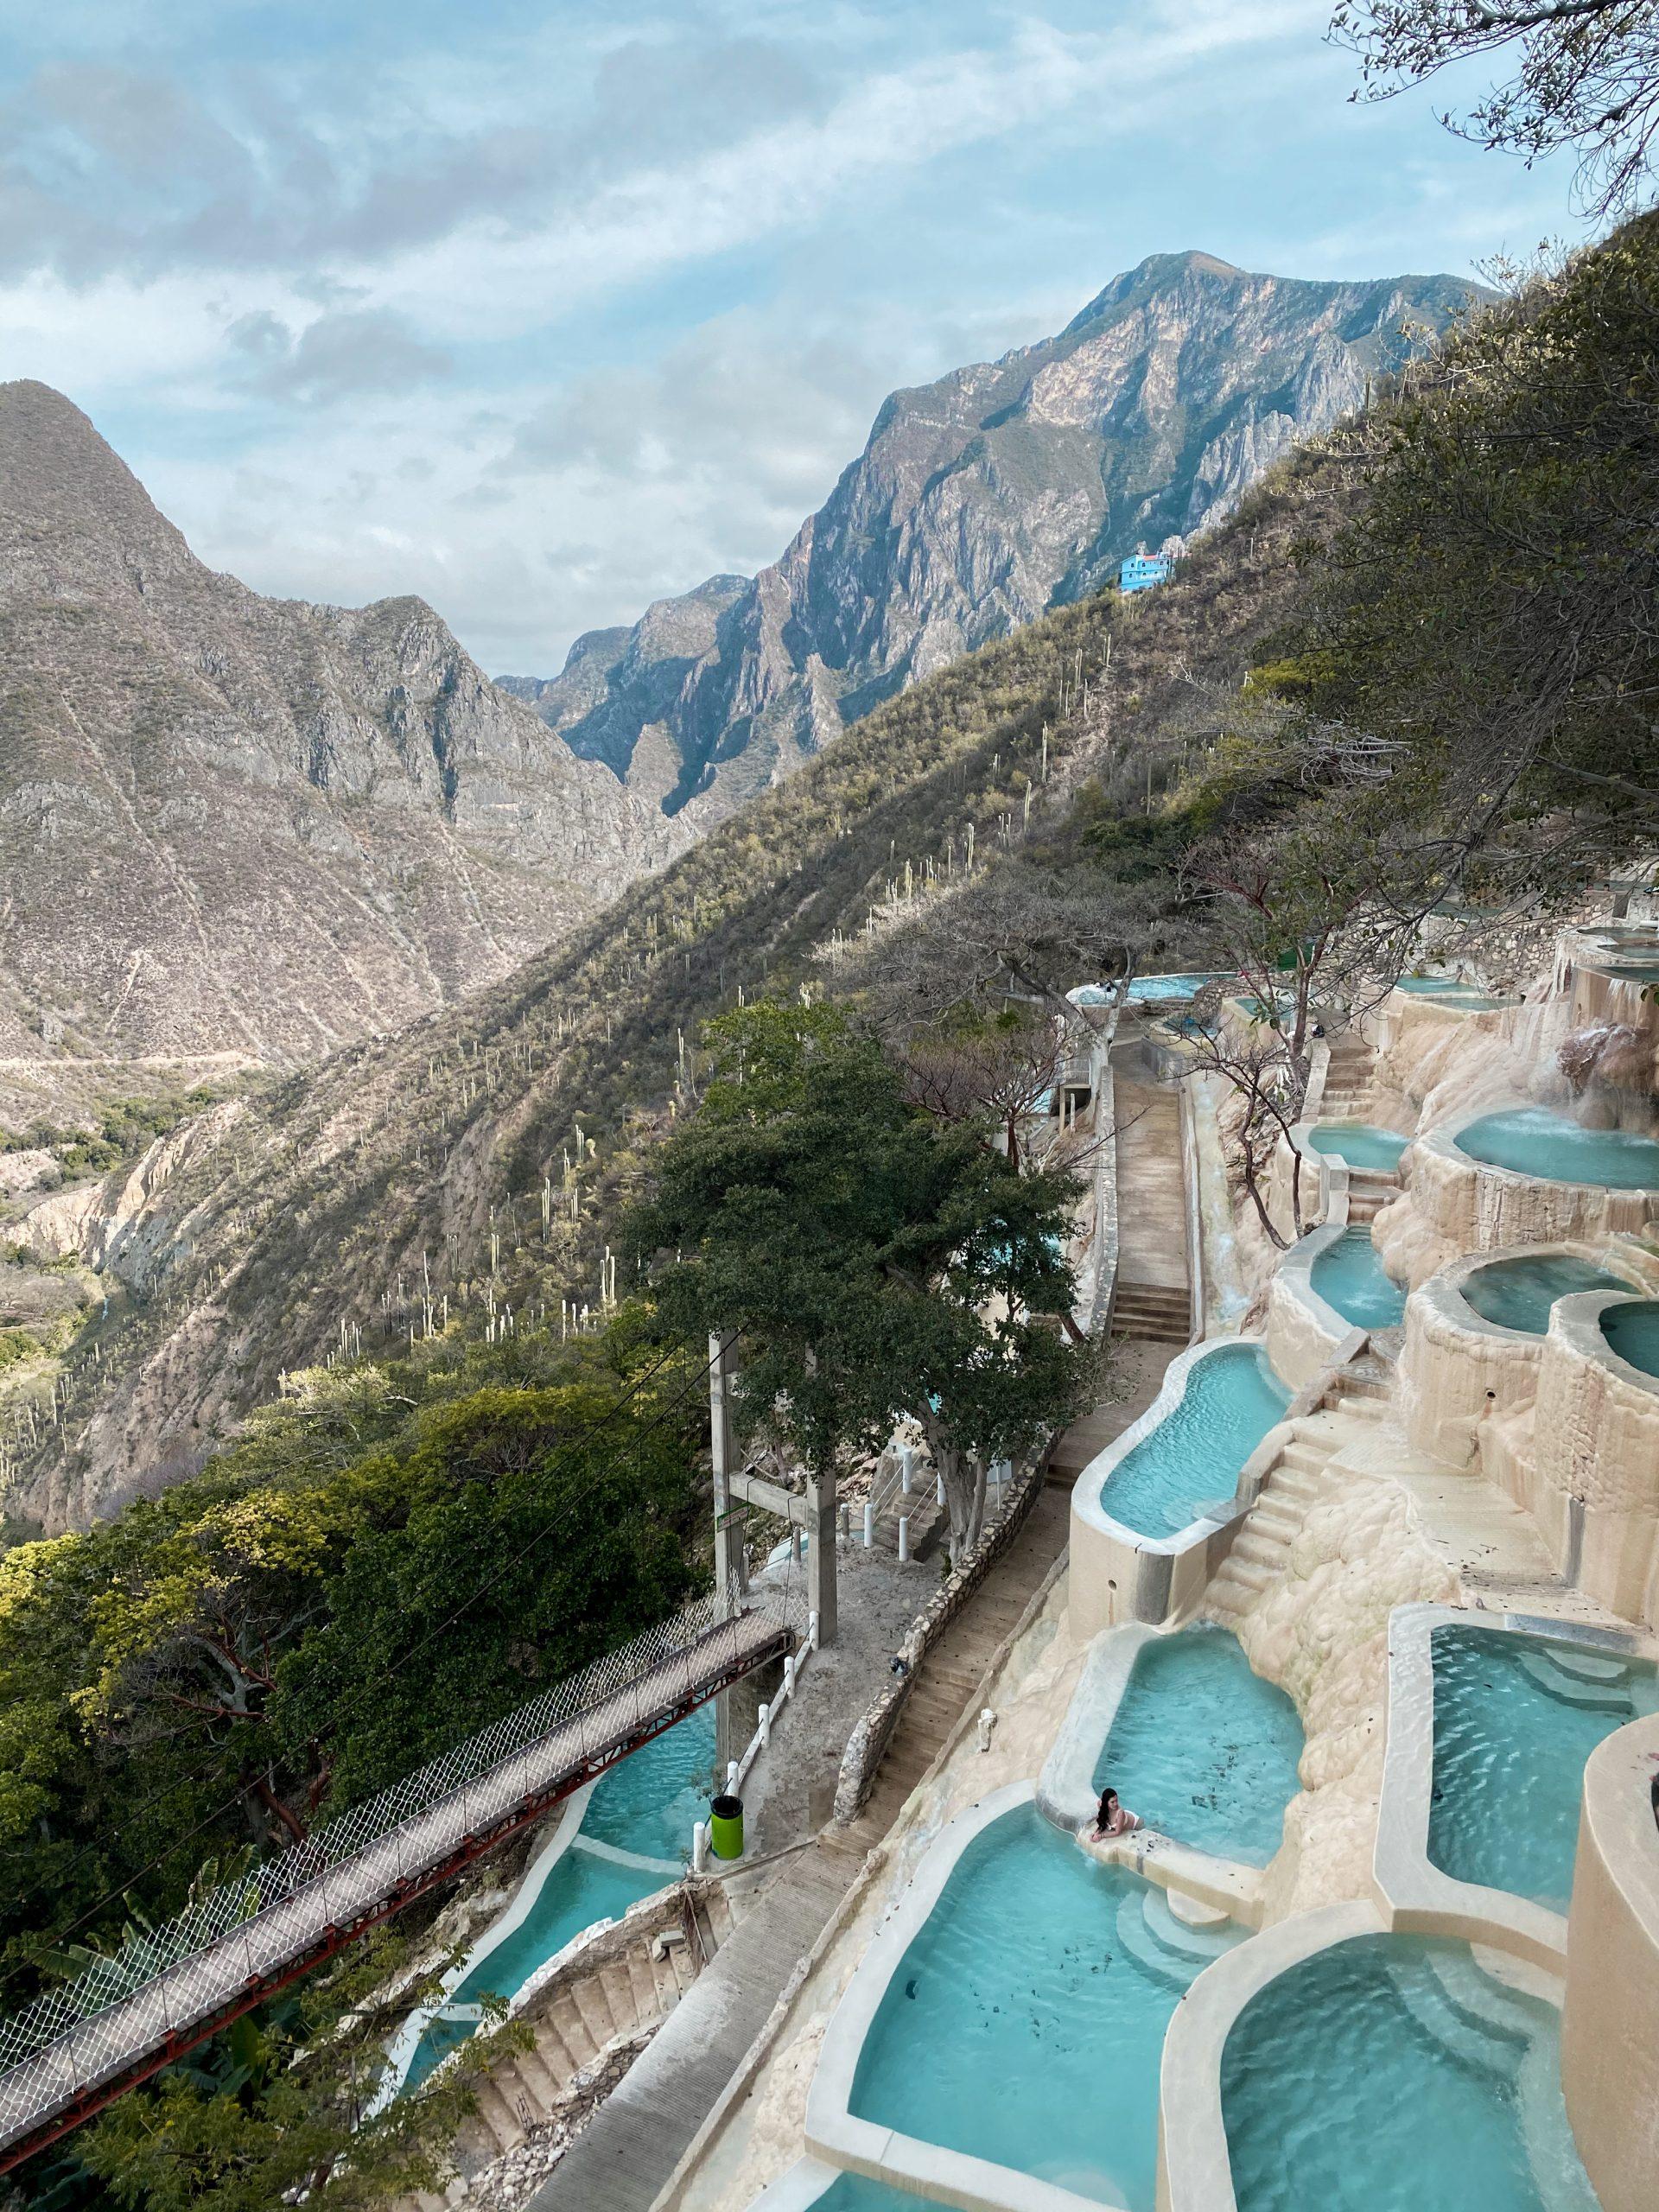 grutas tolantongo carved white thermal pool hidalgo mexico natural hot spring mezquital valley mountains brunette woman eva phan